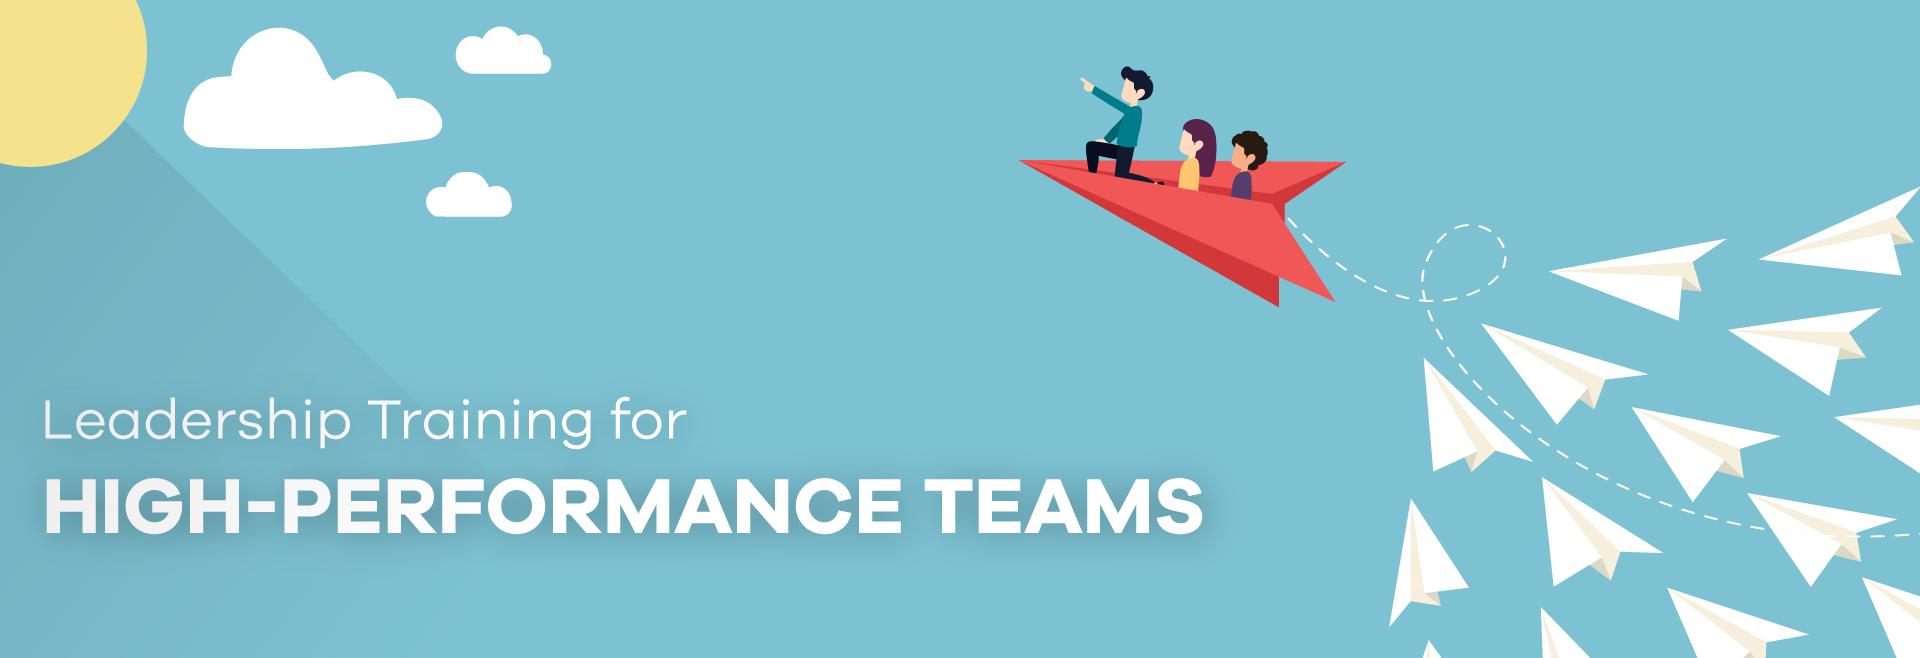 Leadership Training for a High-Performance Team